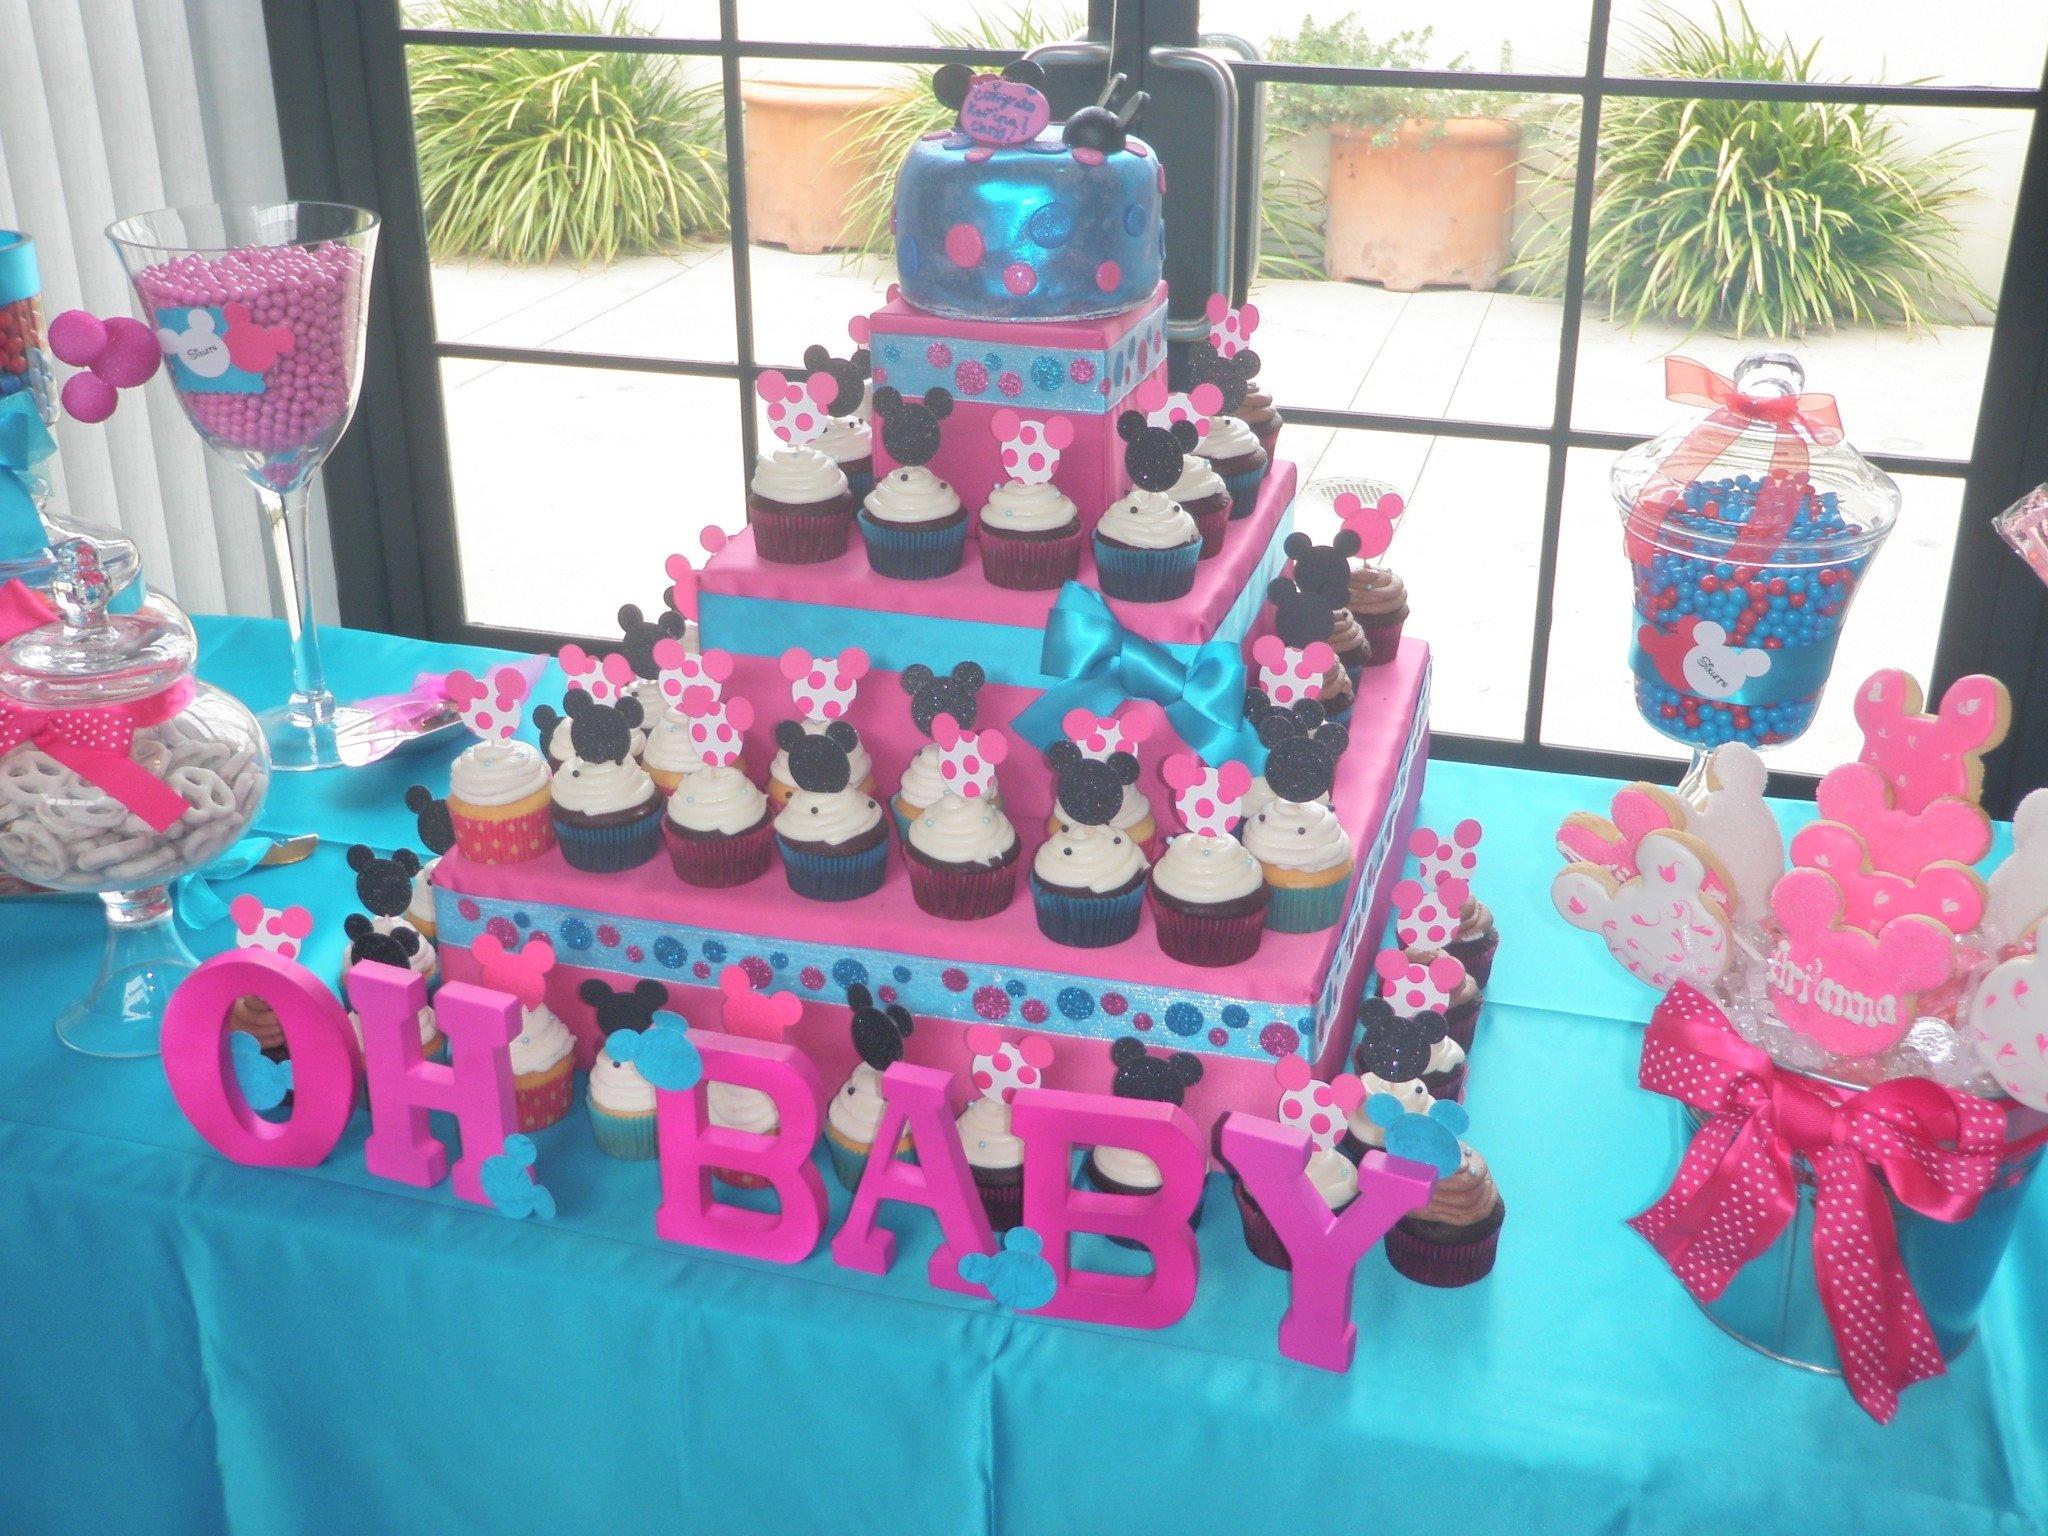 10 Fantastic Twin Girl Baby Shower Ideas twin girl baby shower decor e280a2 baby showers ideas 1 2020